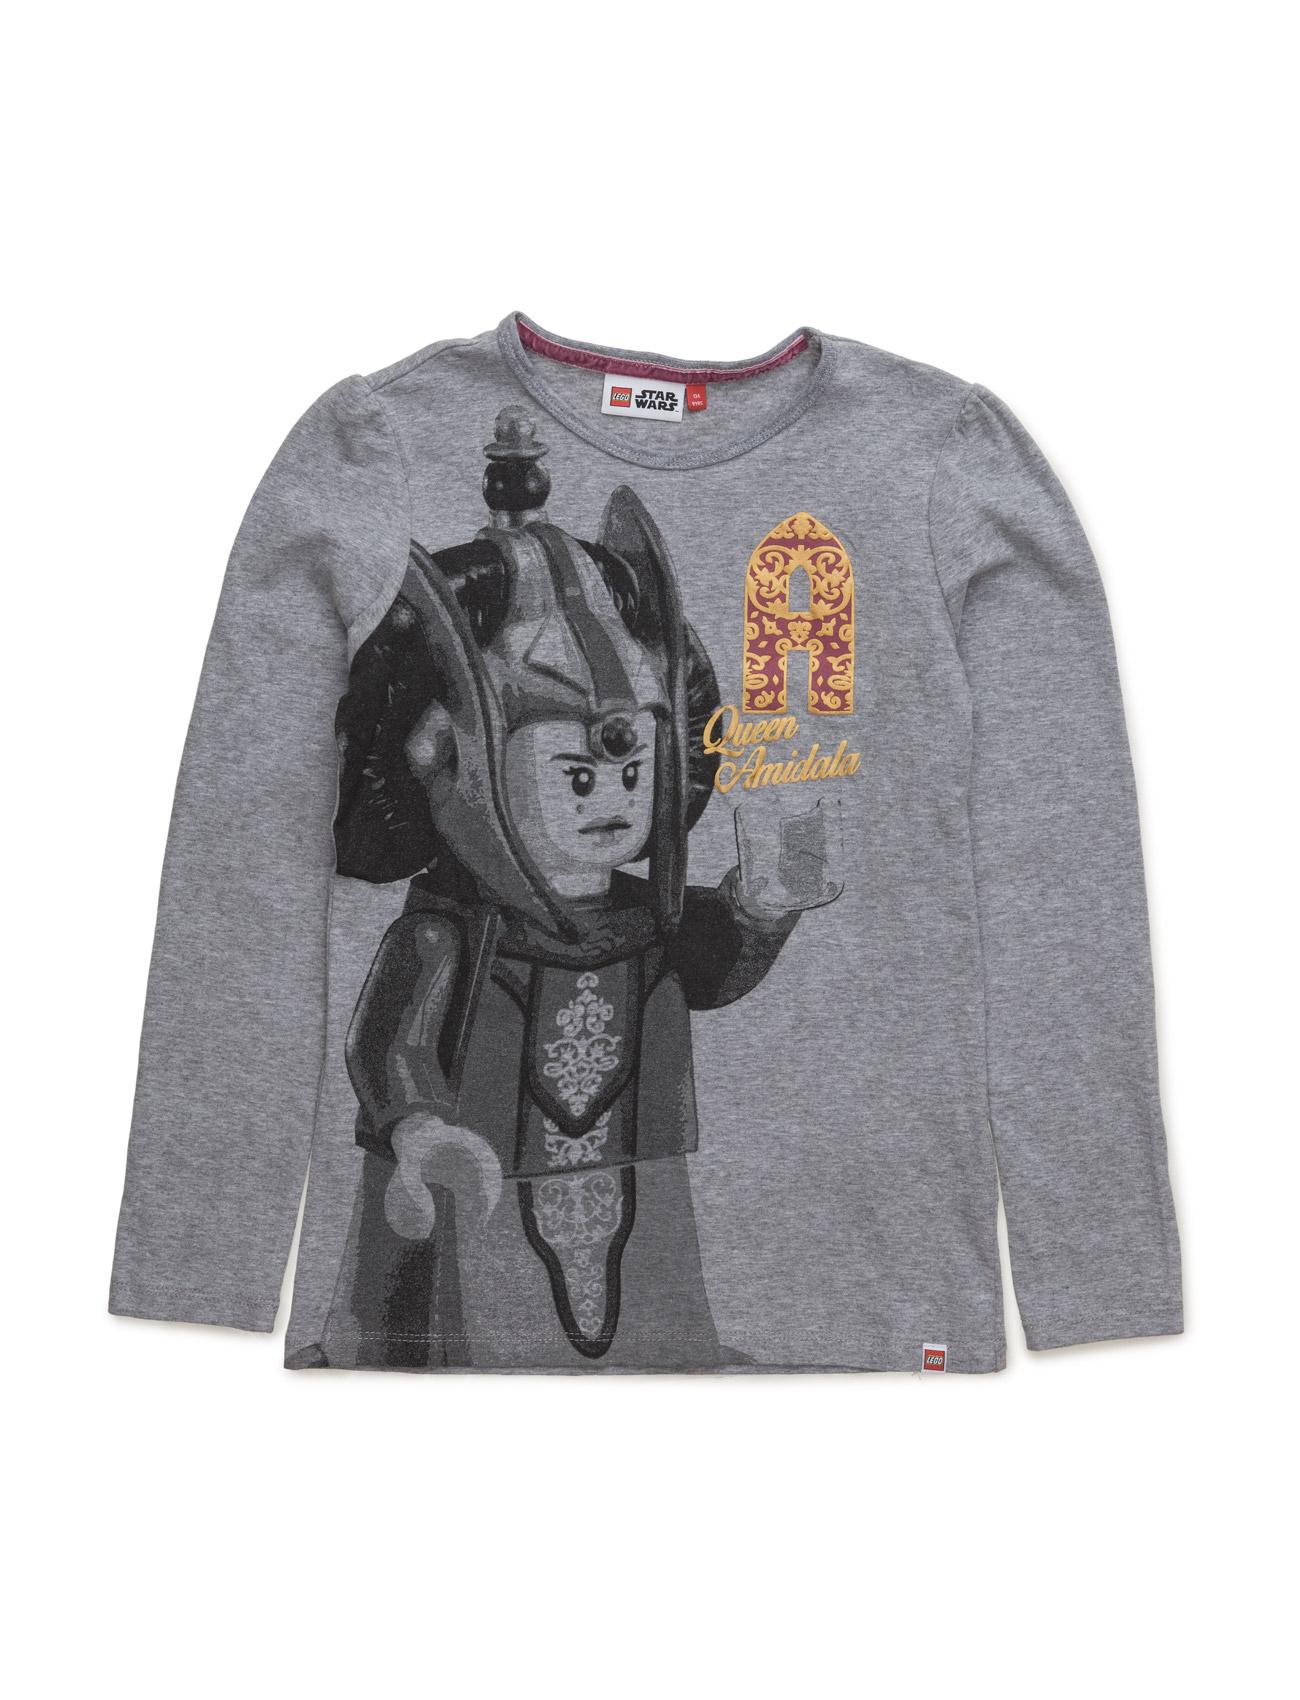 Tamara 951 T Shirt LS Lego wear Langærmede t shirts til